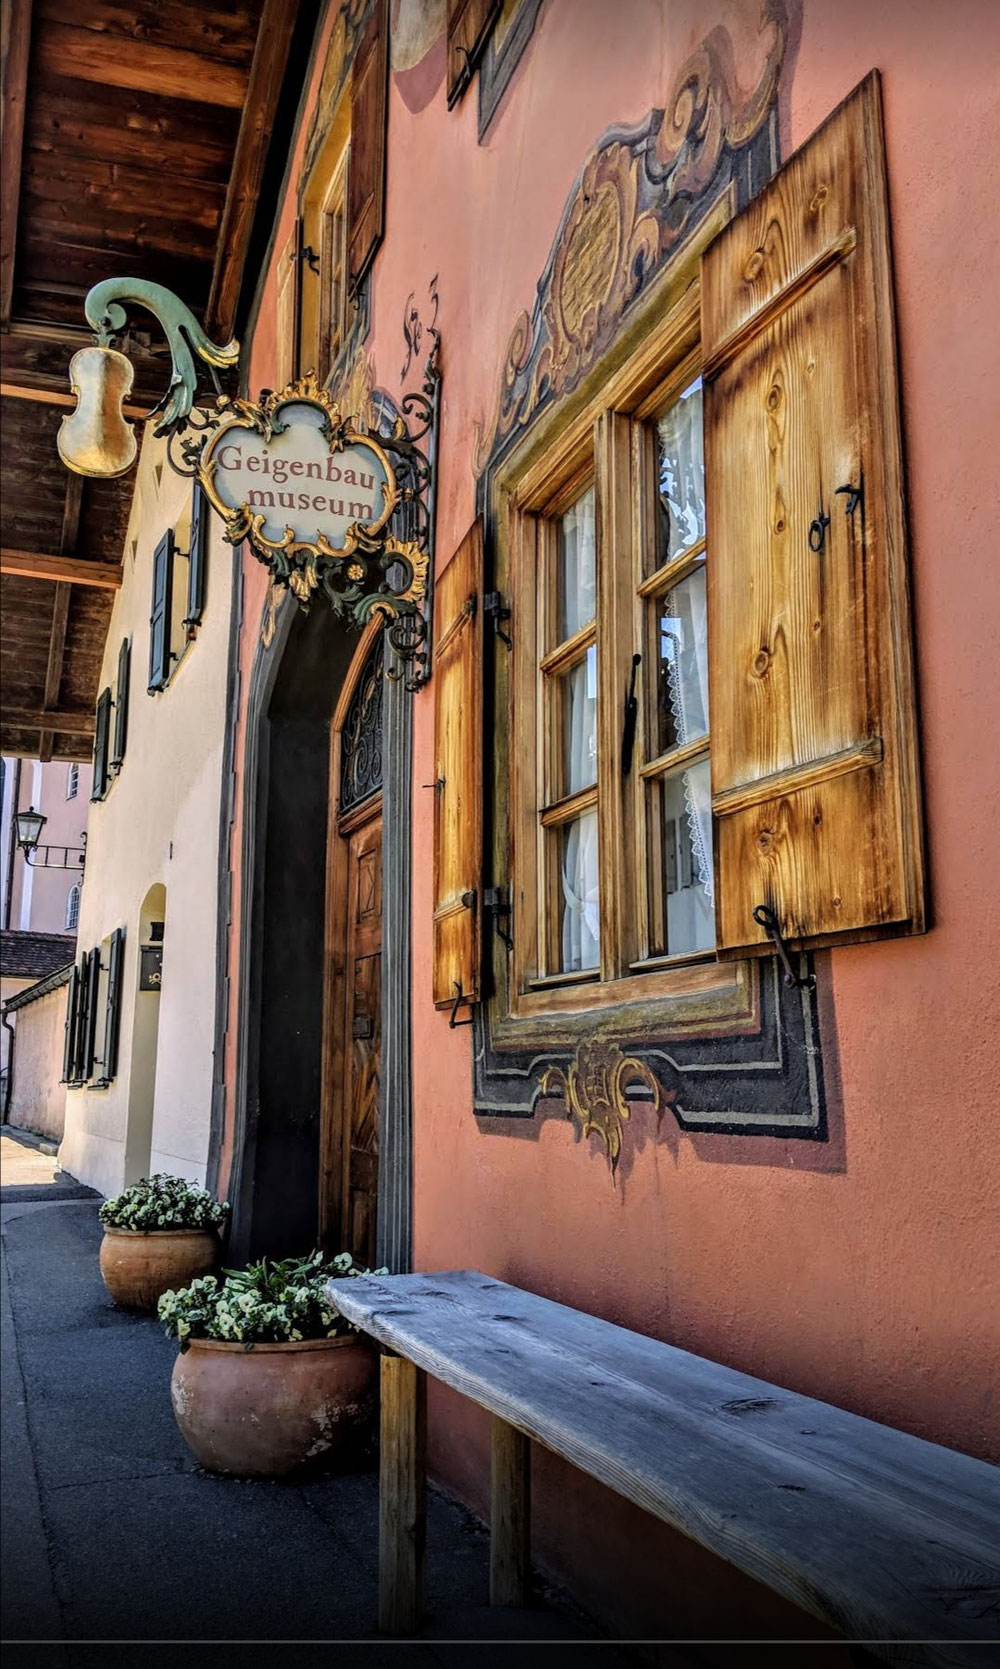 Geigenbau-Museum